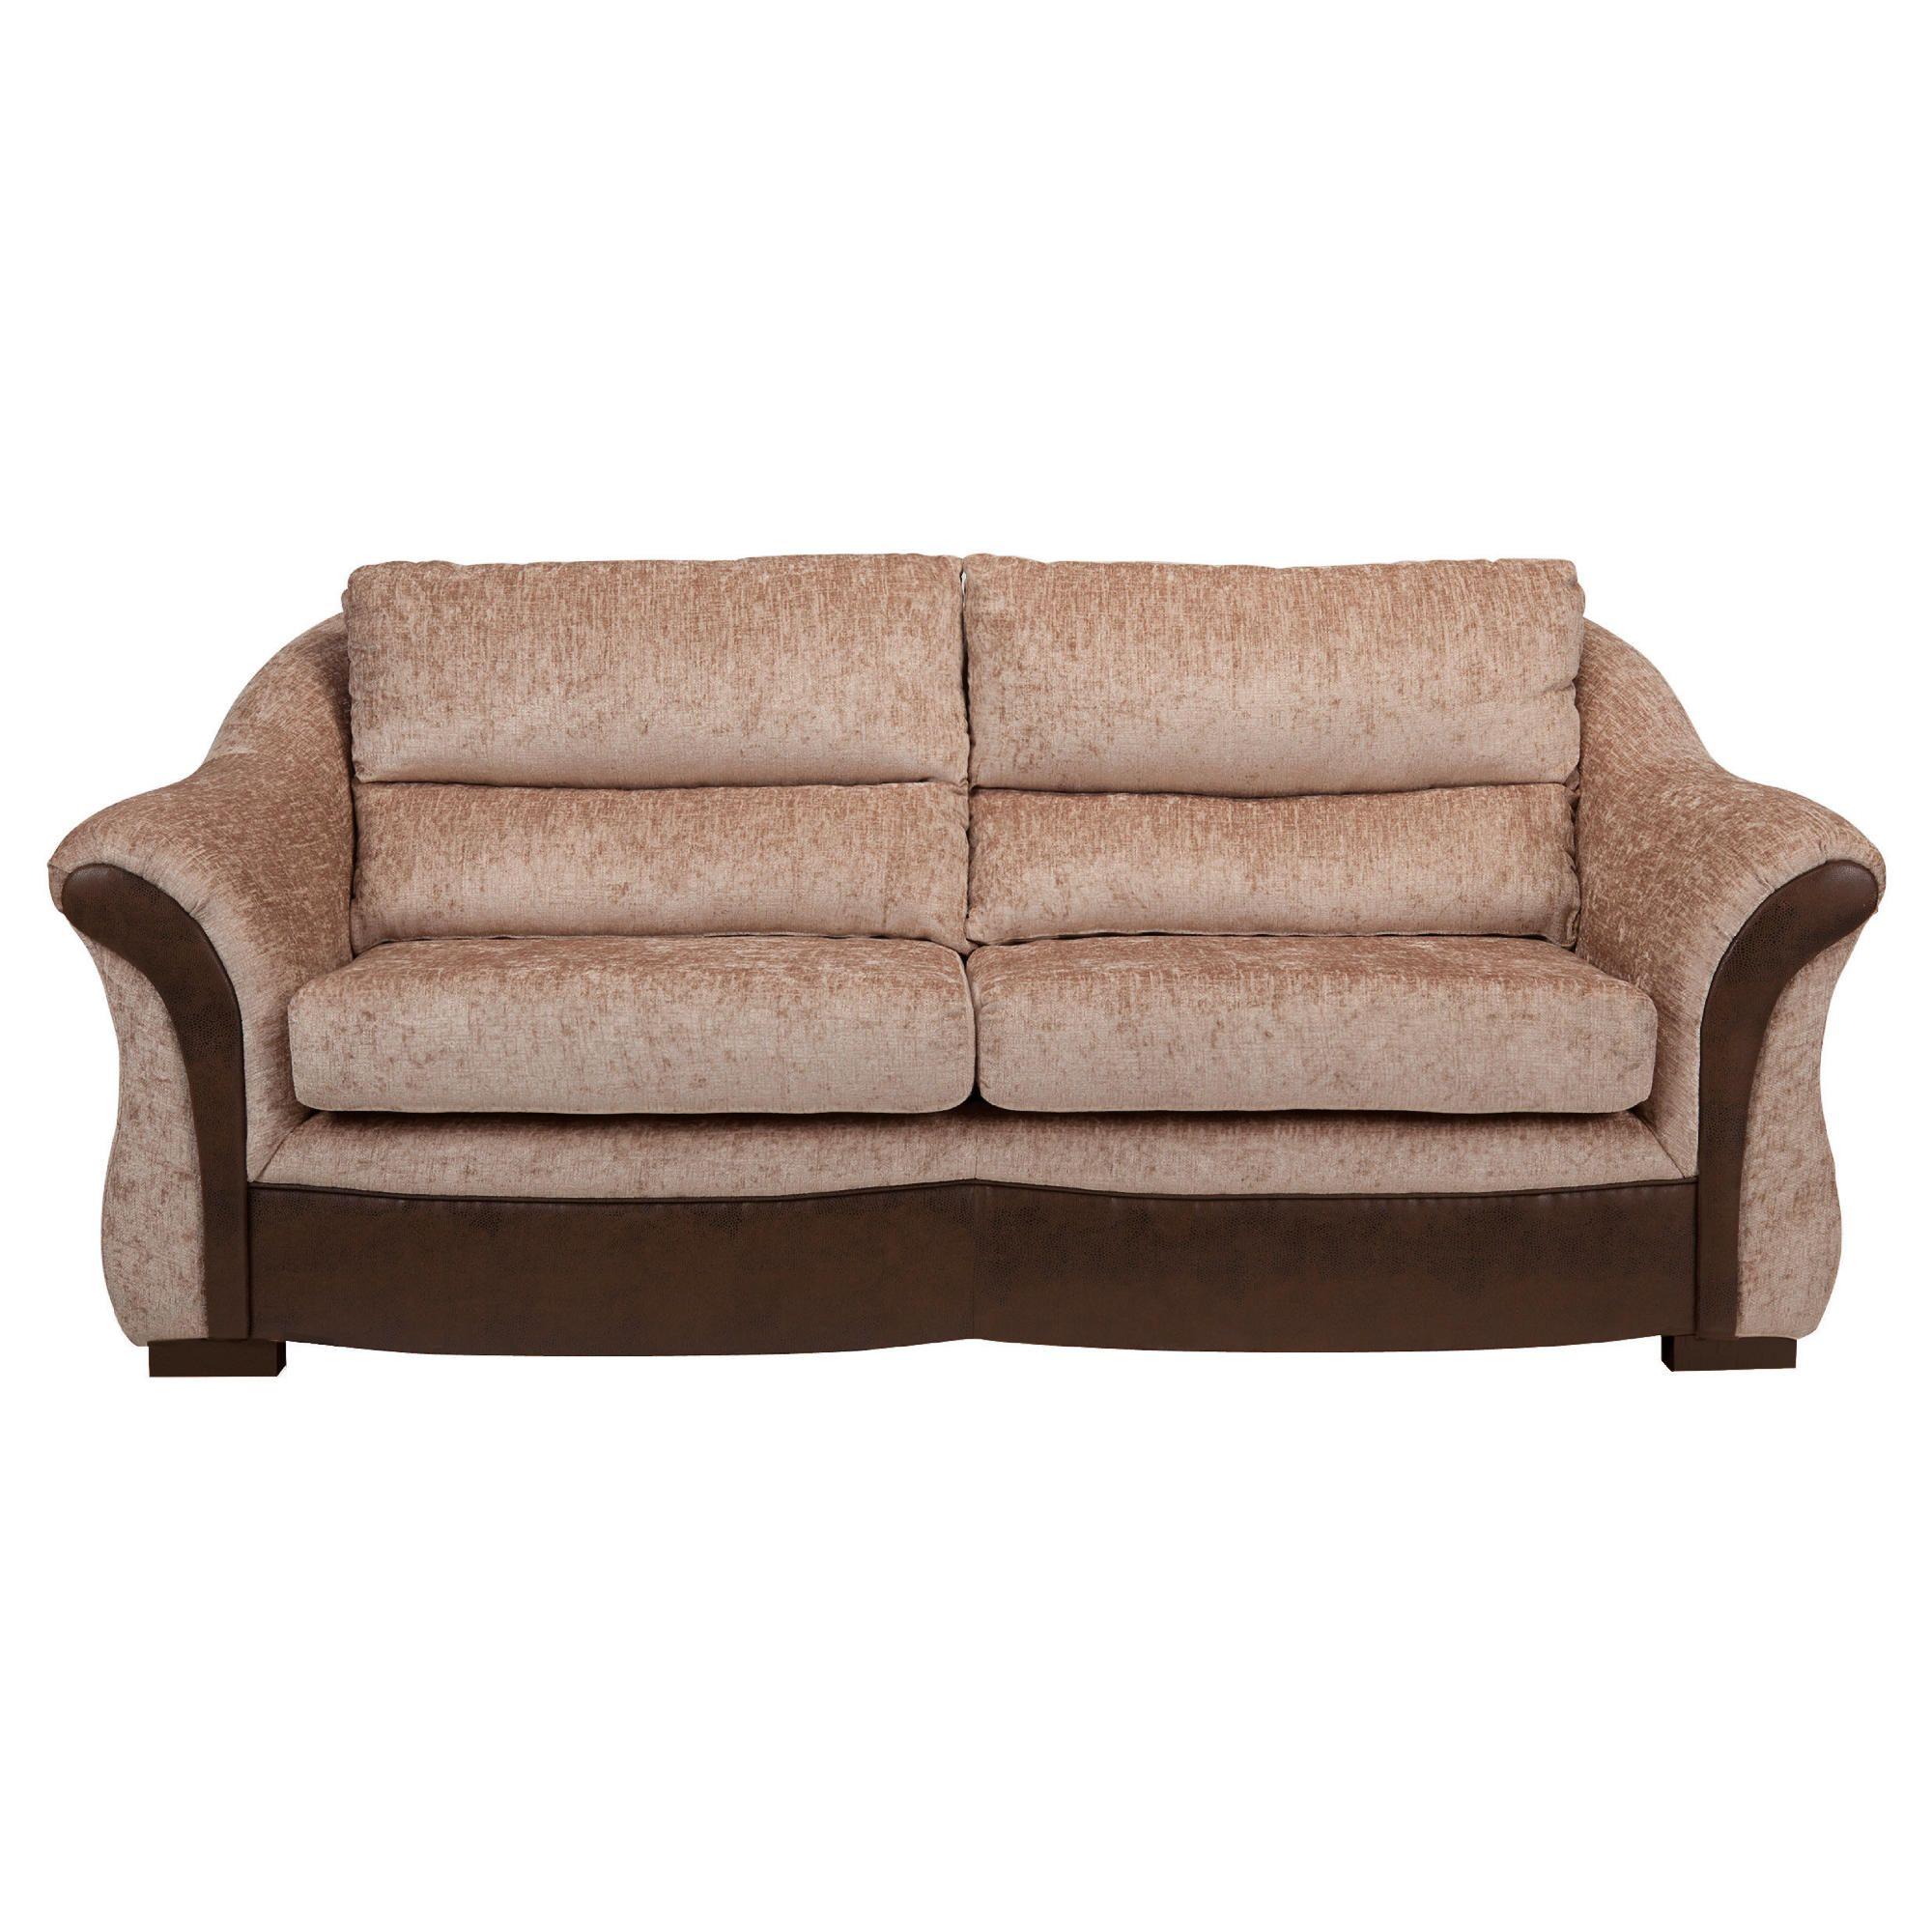 Windsor Fabric Large Sofa Mink at Tesco Direct